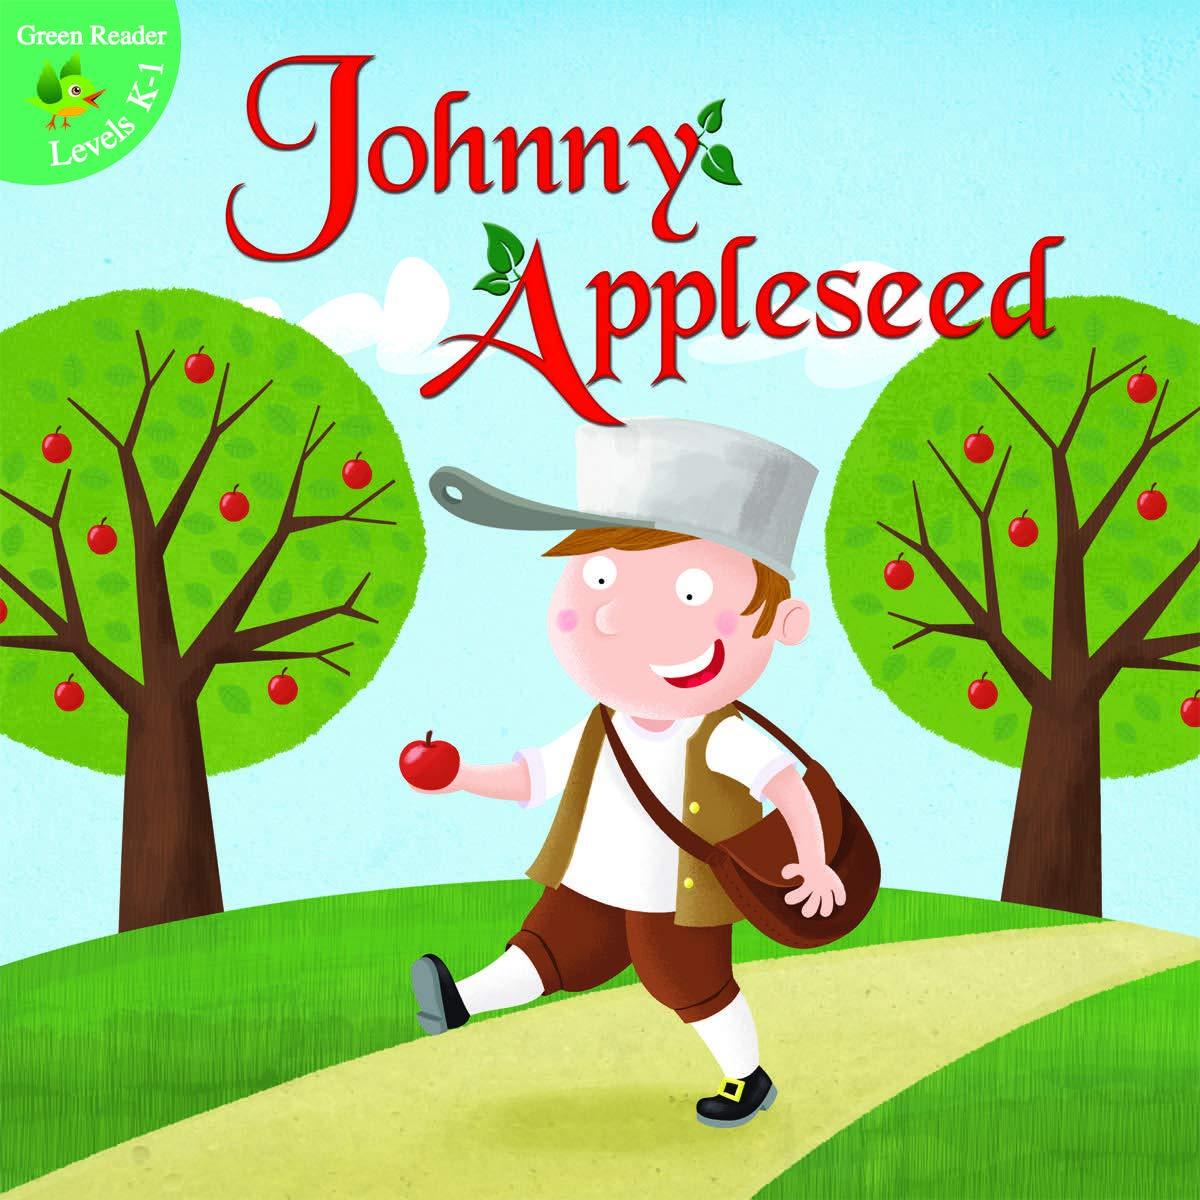 Amazon.com: Johnny Appleseed (Little Birdie Books) (9781618103017): Suen, Anastasia, Myer, Ed: Books